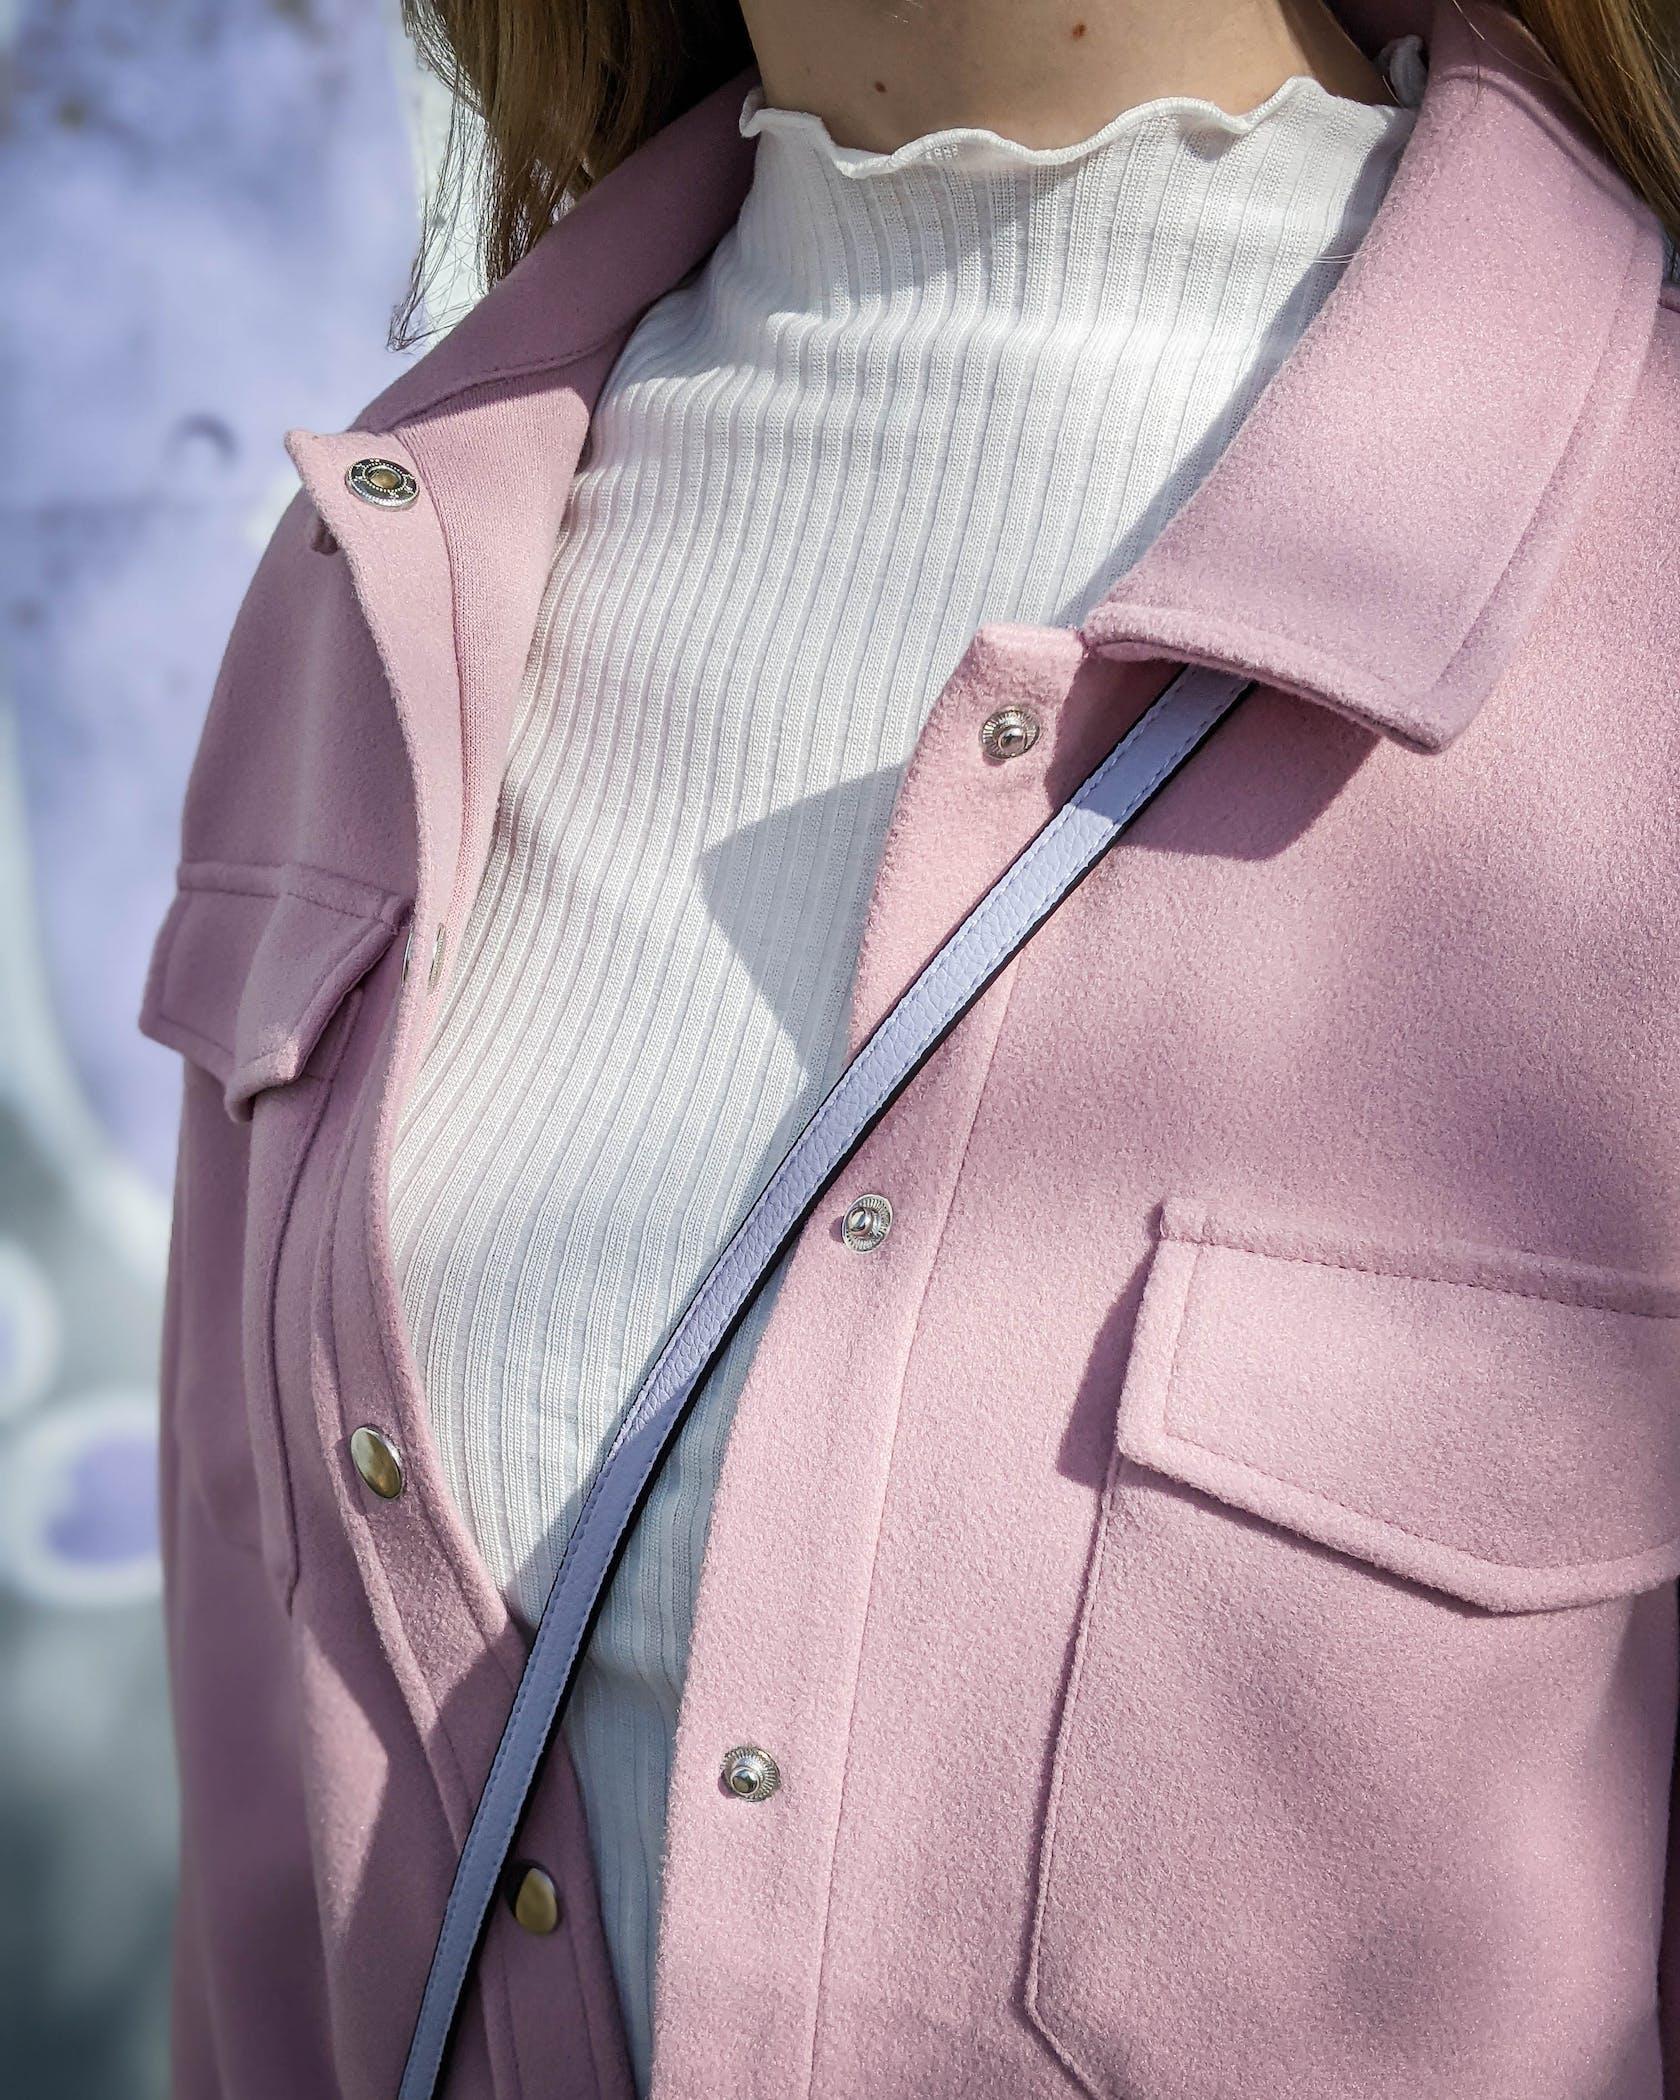 Nahaufnahme Rippshirt mit rosafarbener XXL-Jacke